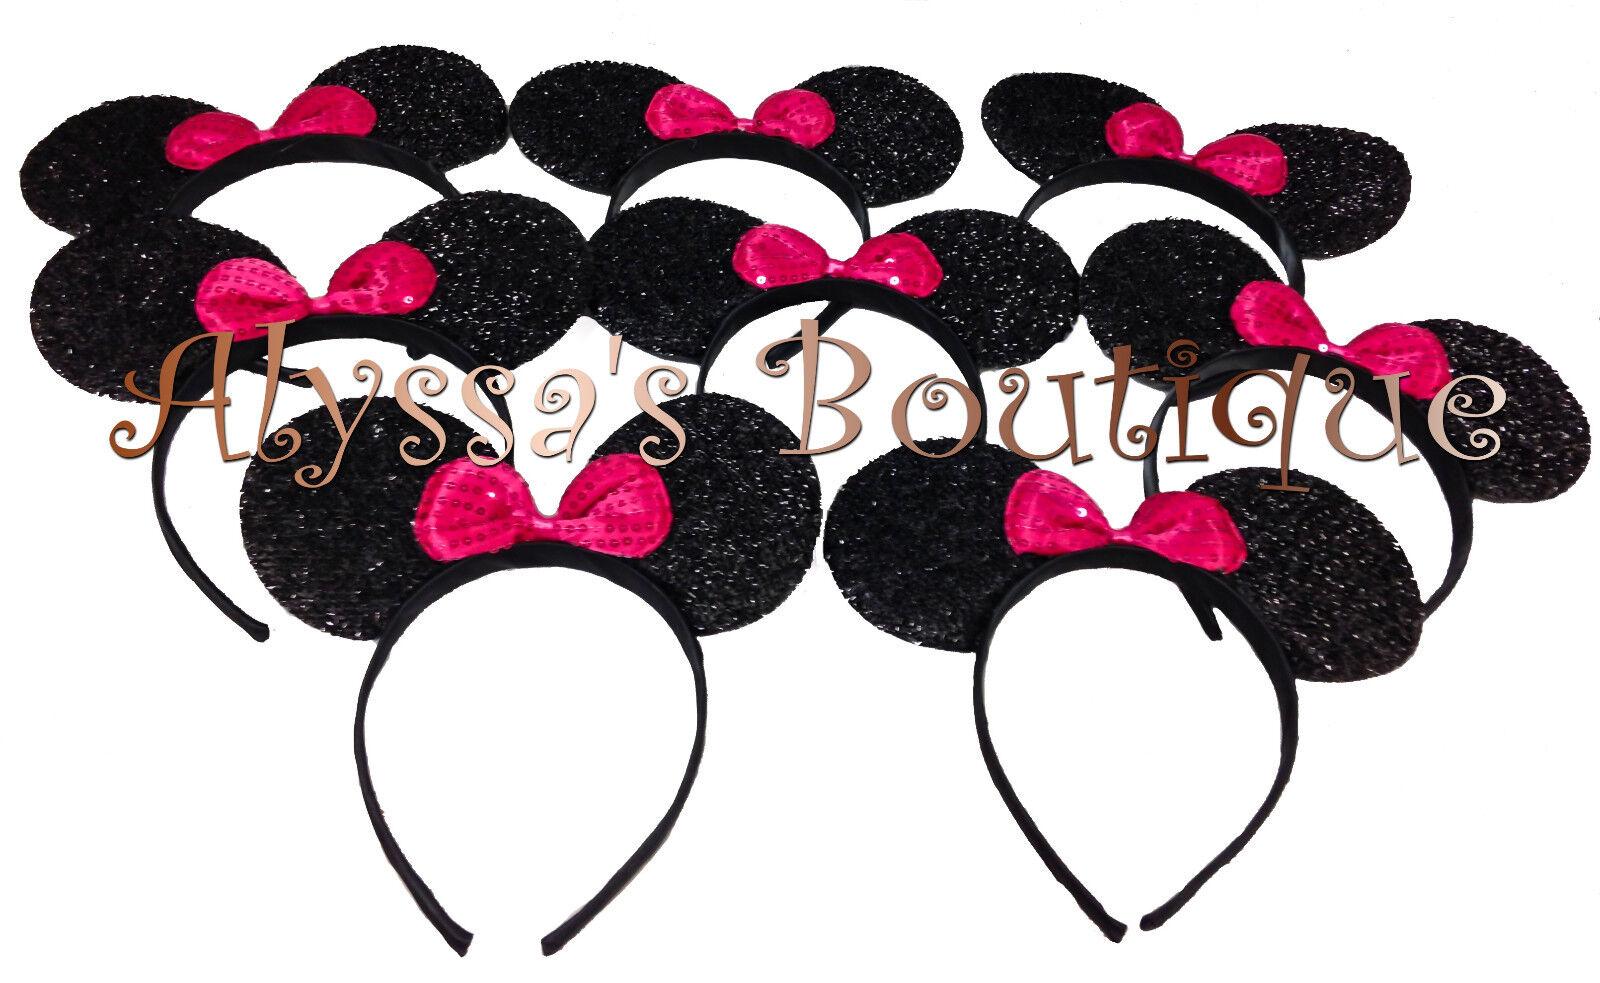 12 pcs Minnie Mickey Mouse Ears Headbands Shiny Black Silver Pink Birthday Party